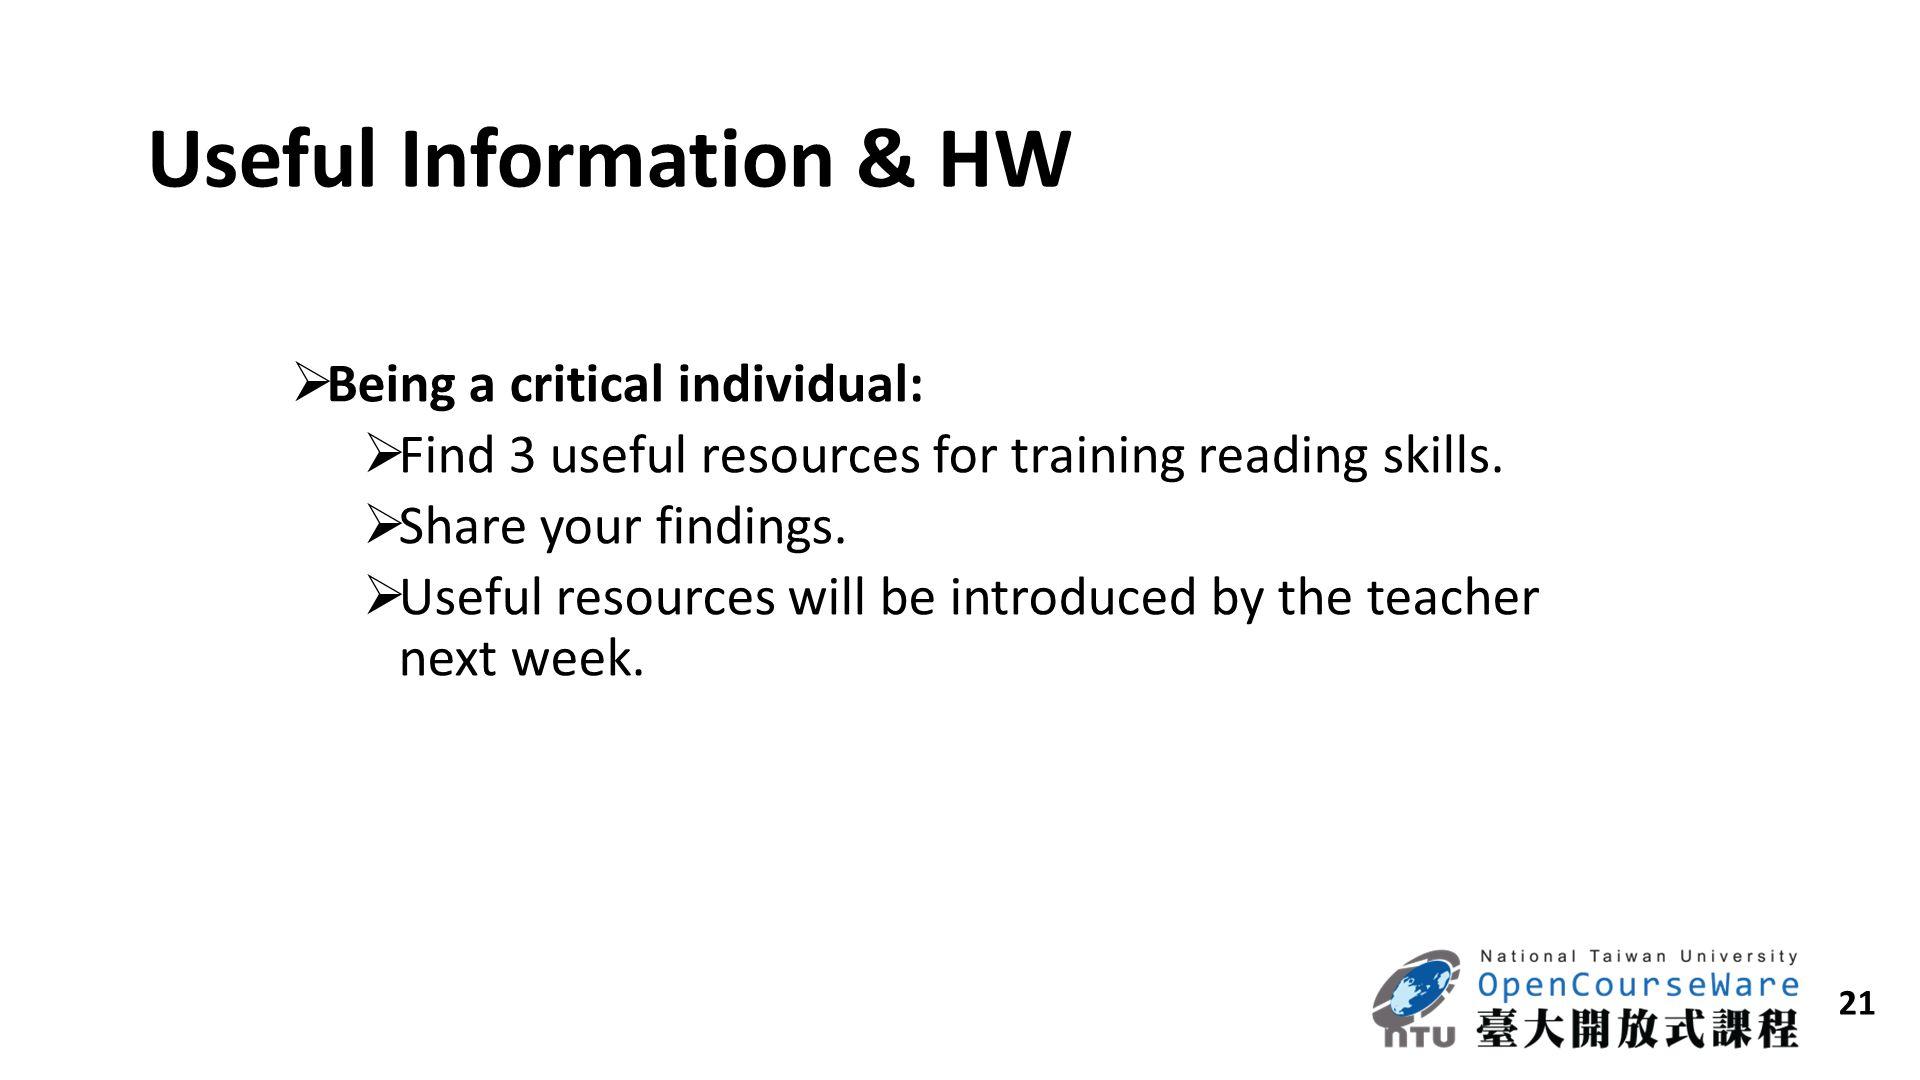 Useful Information & HW